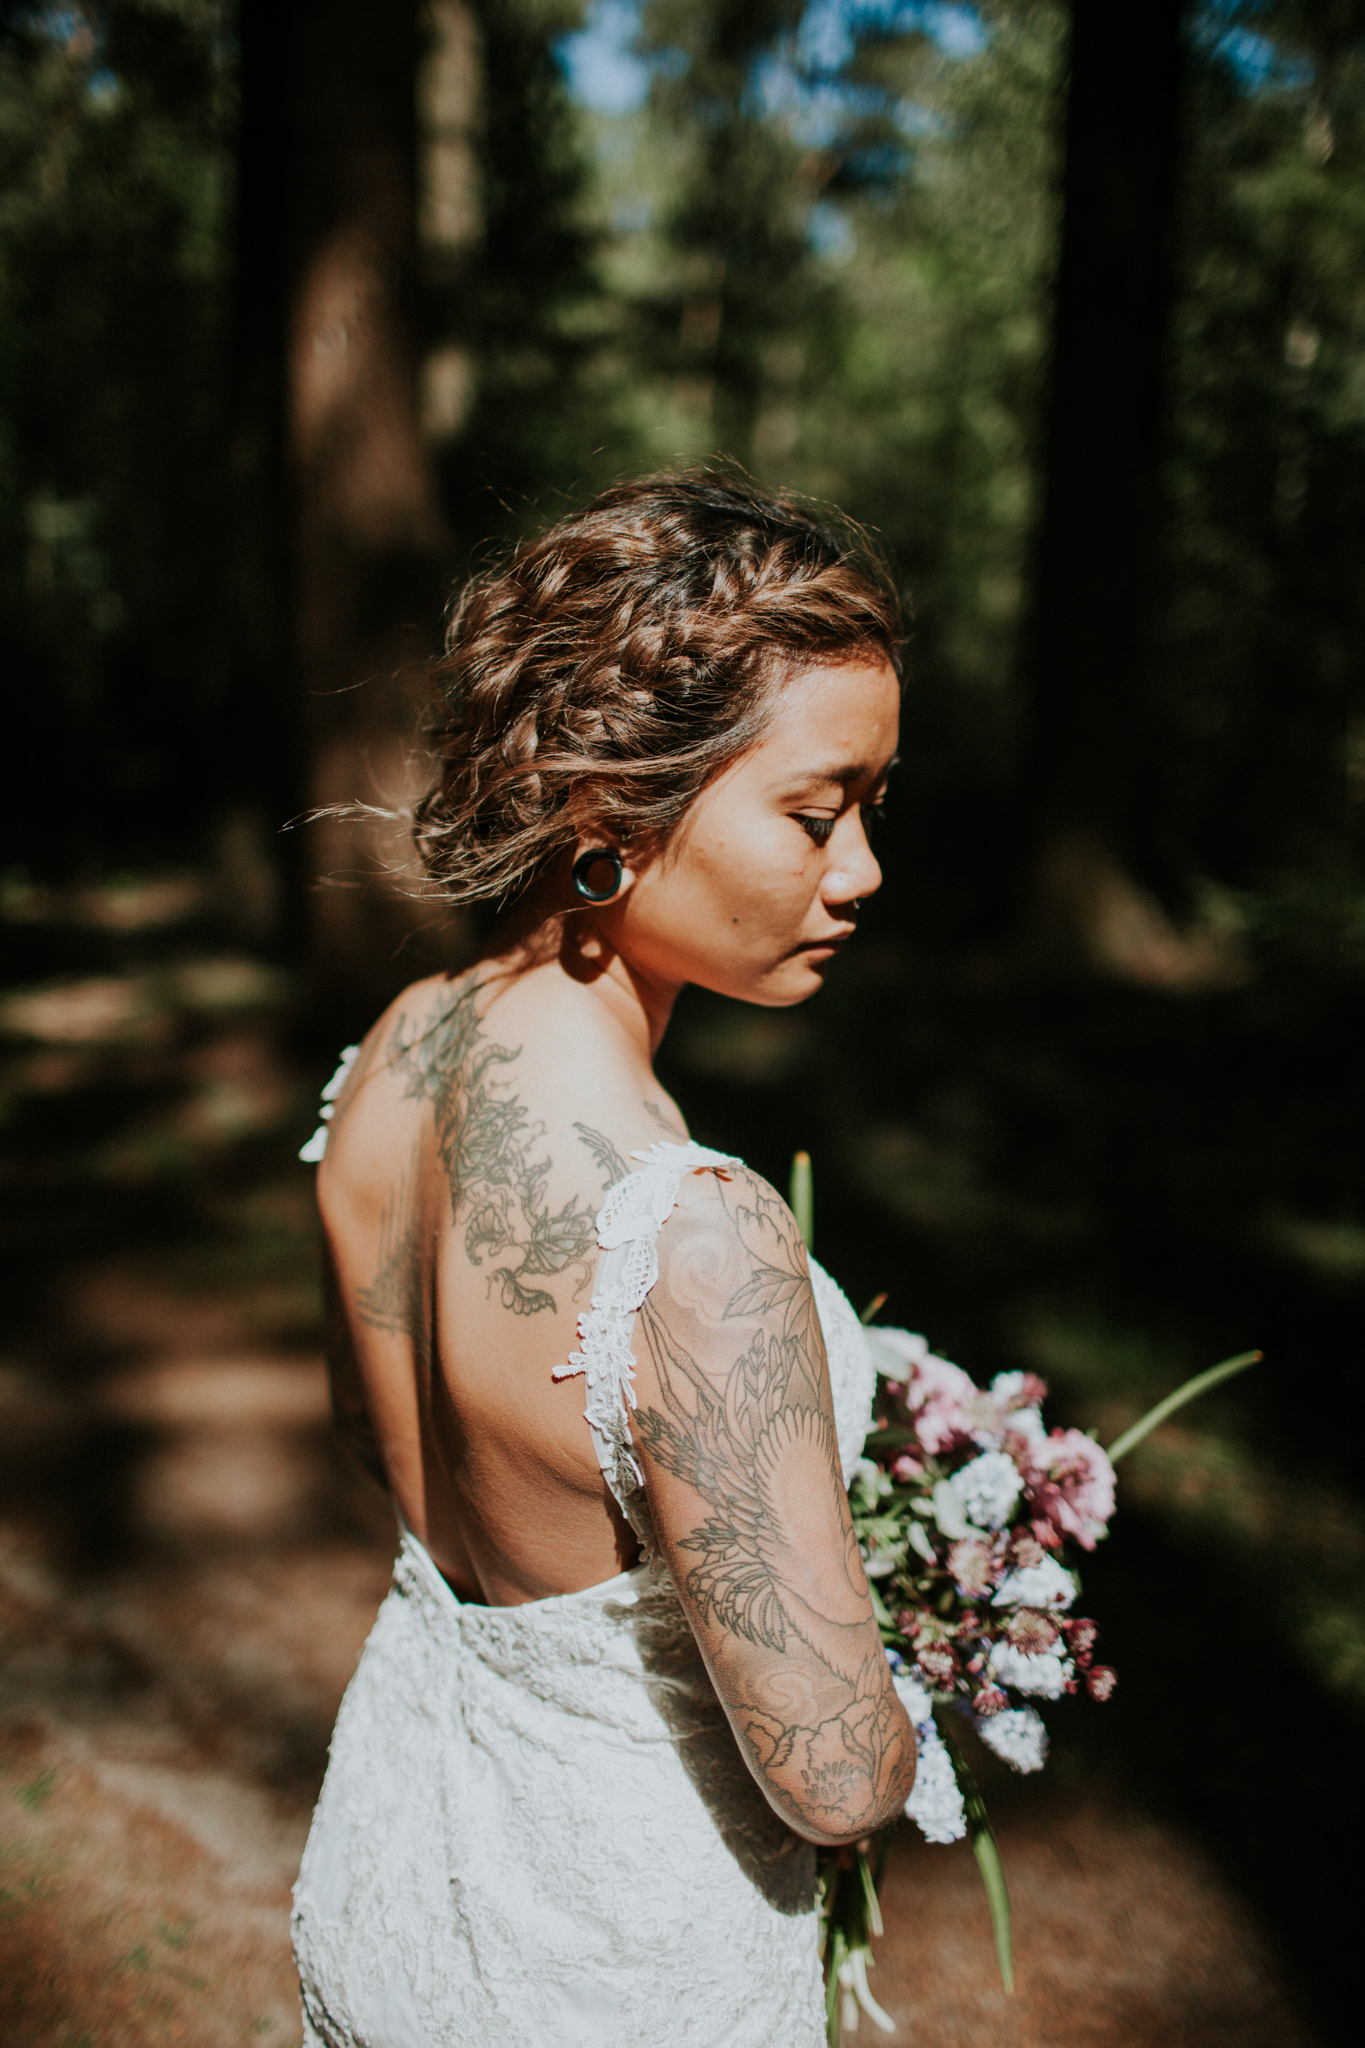 Bruidskapsels - bos